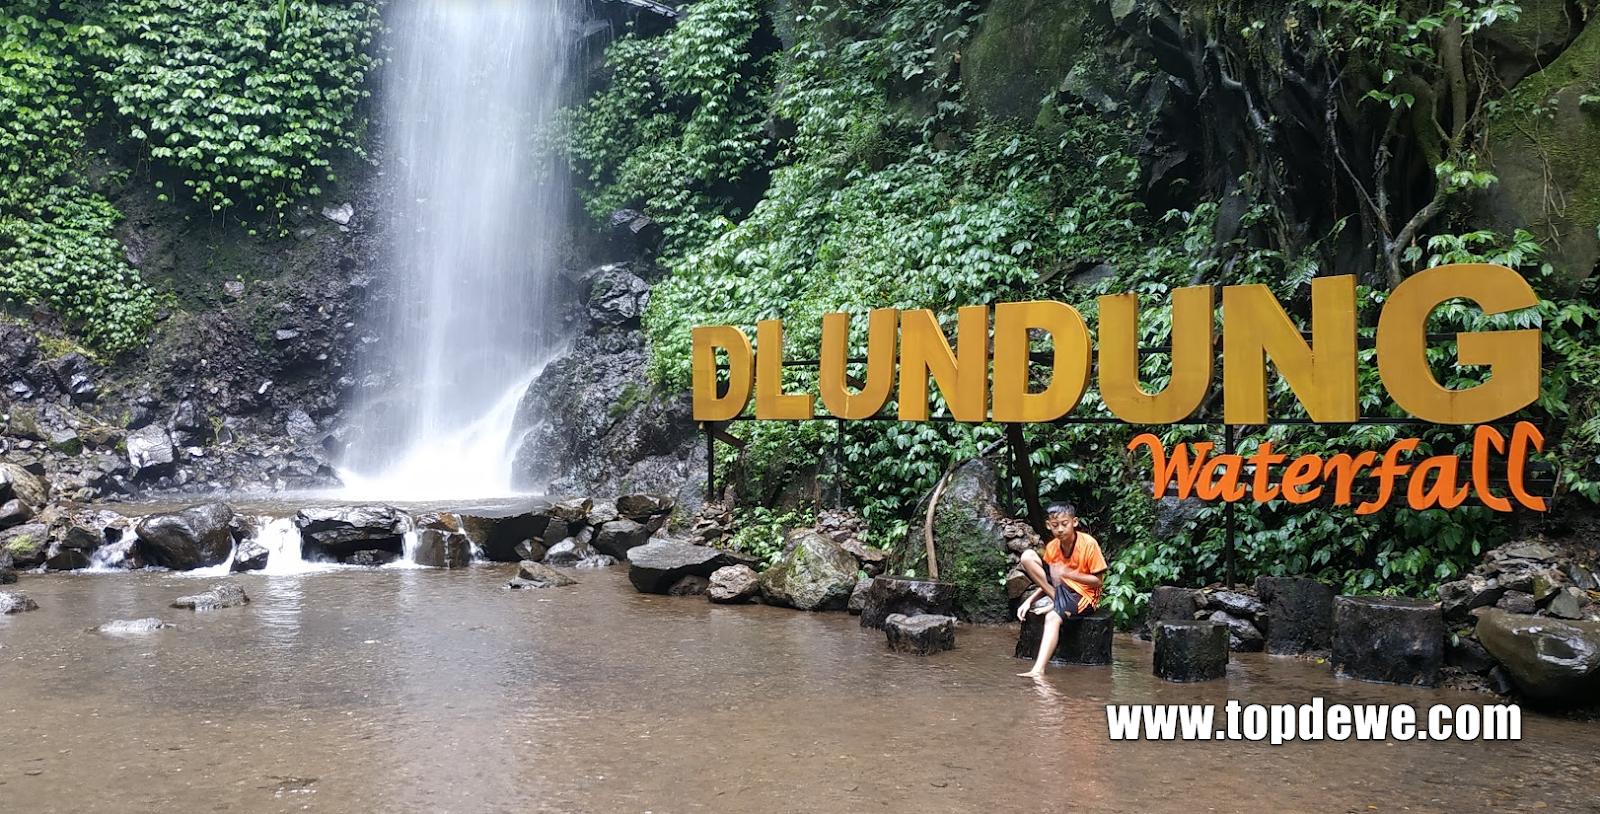 Air Terjun Dlundung,Wisata Murah & Sejuk di Trawas Mojokerto ...